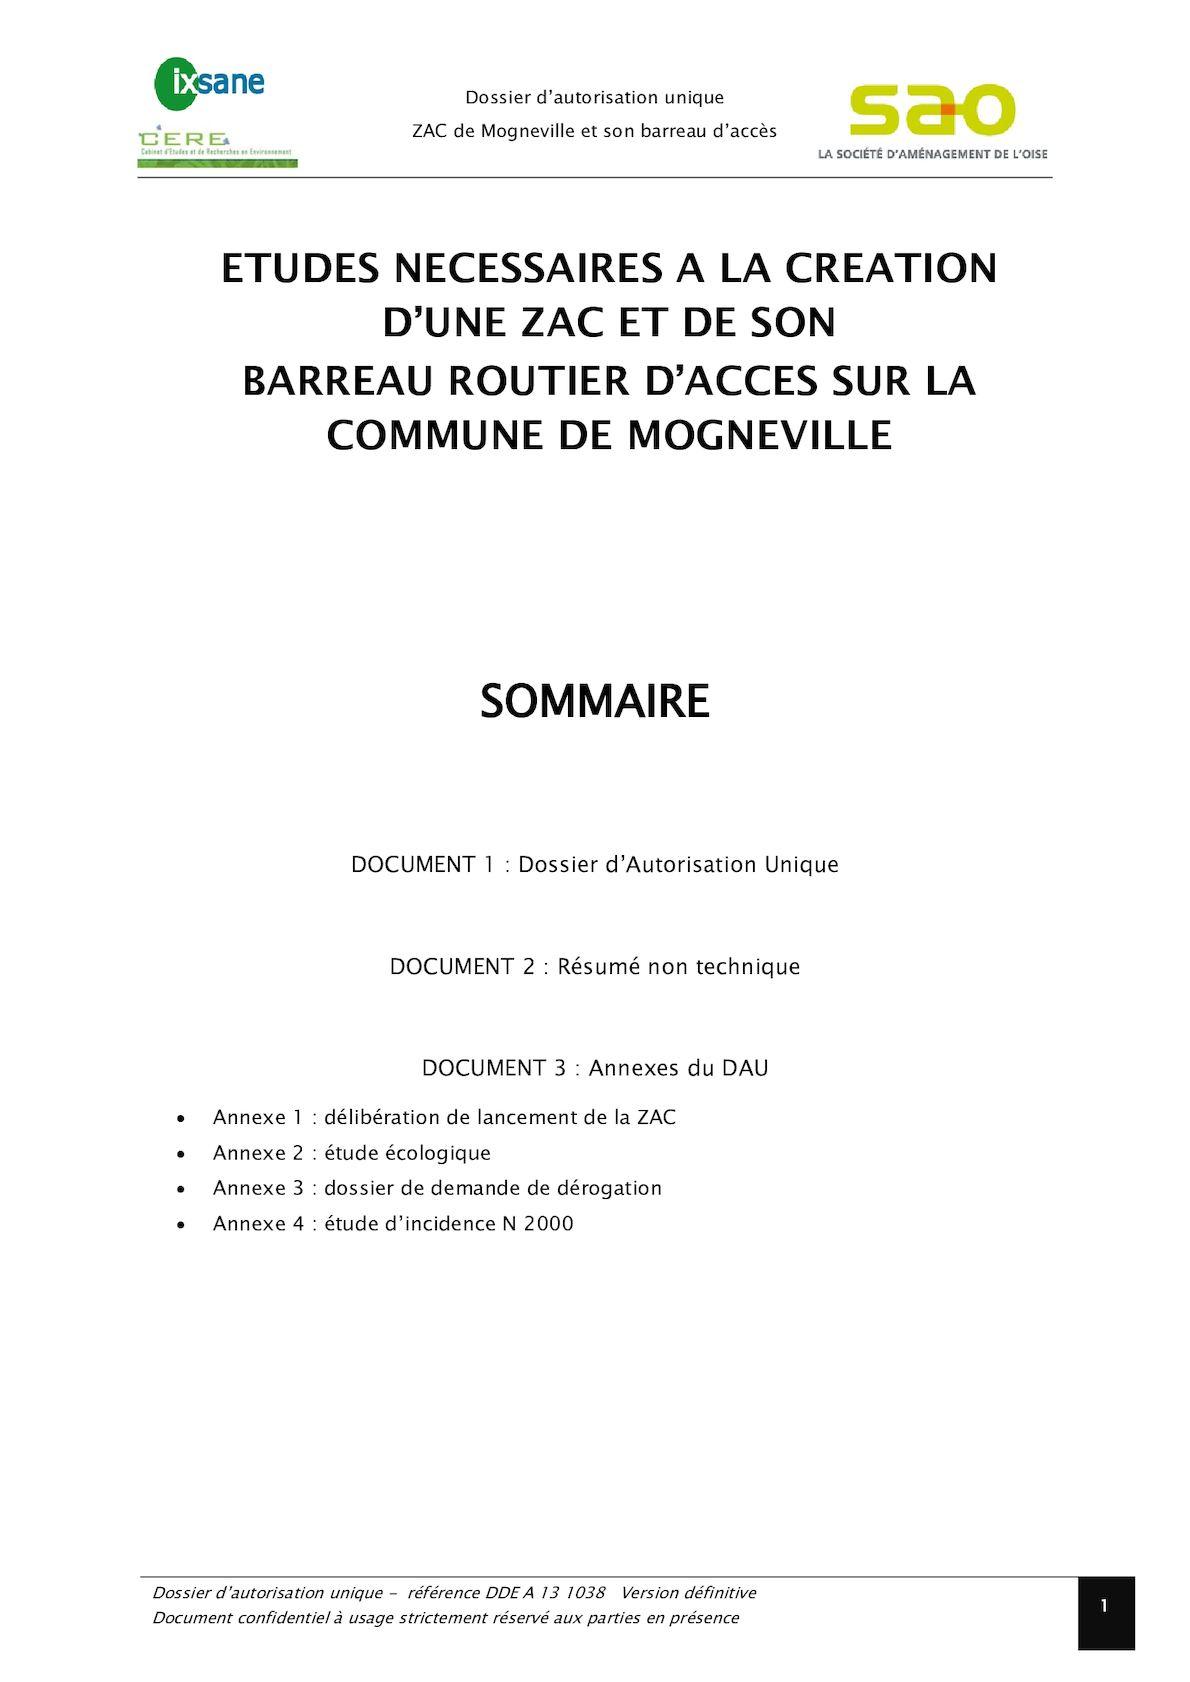 Calendrier Lunaire Aout 2016 Rustica Inspirant Stock Calaméo Document 1 Dau